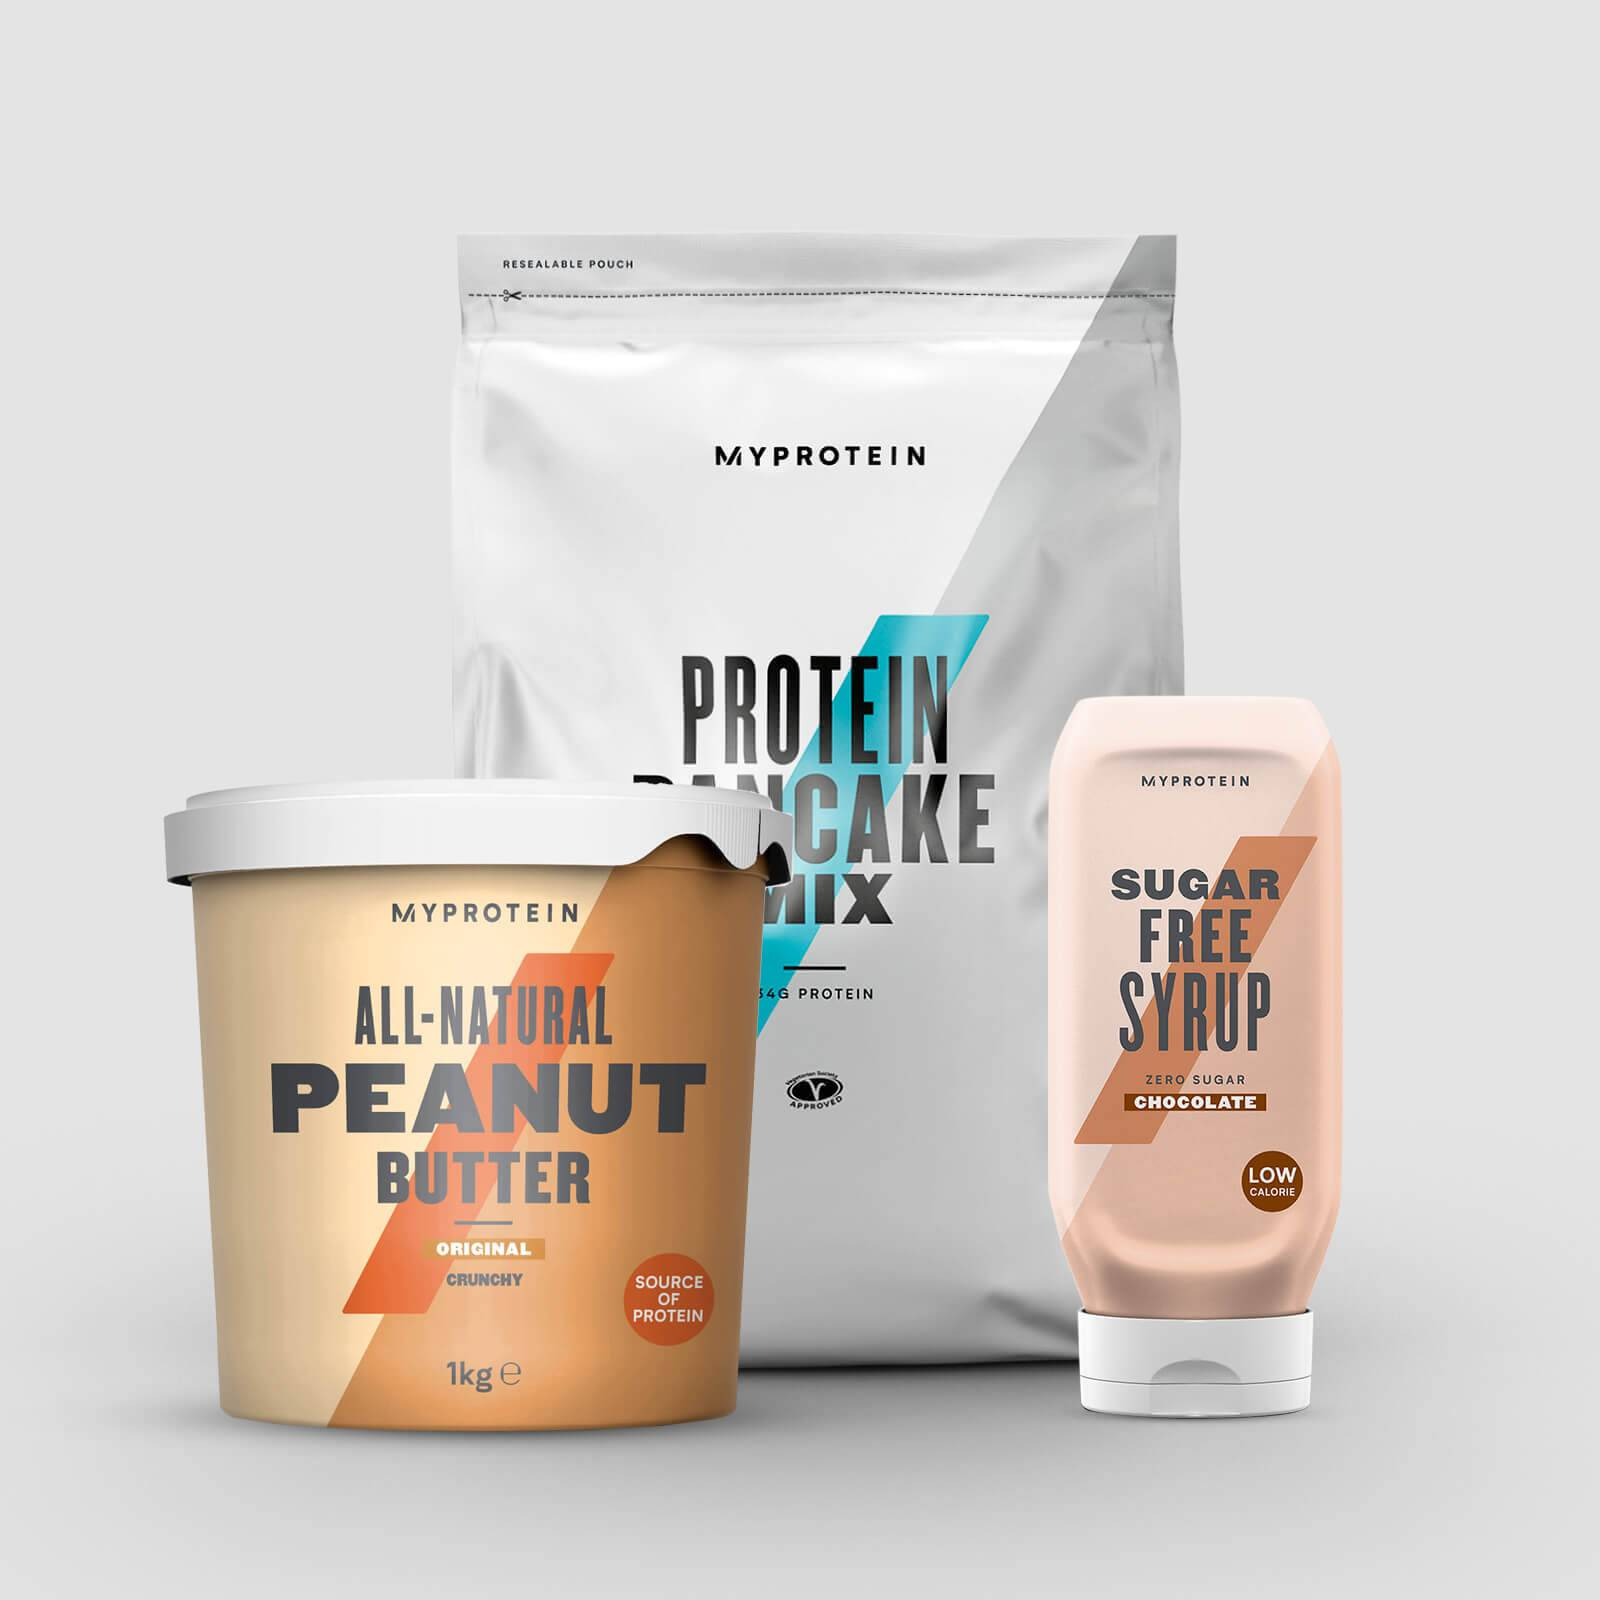 Pack pour Pancake Protéiné - Pancake Mix - Chocolate - Syrup - Maple